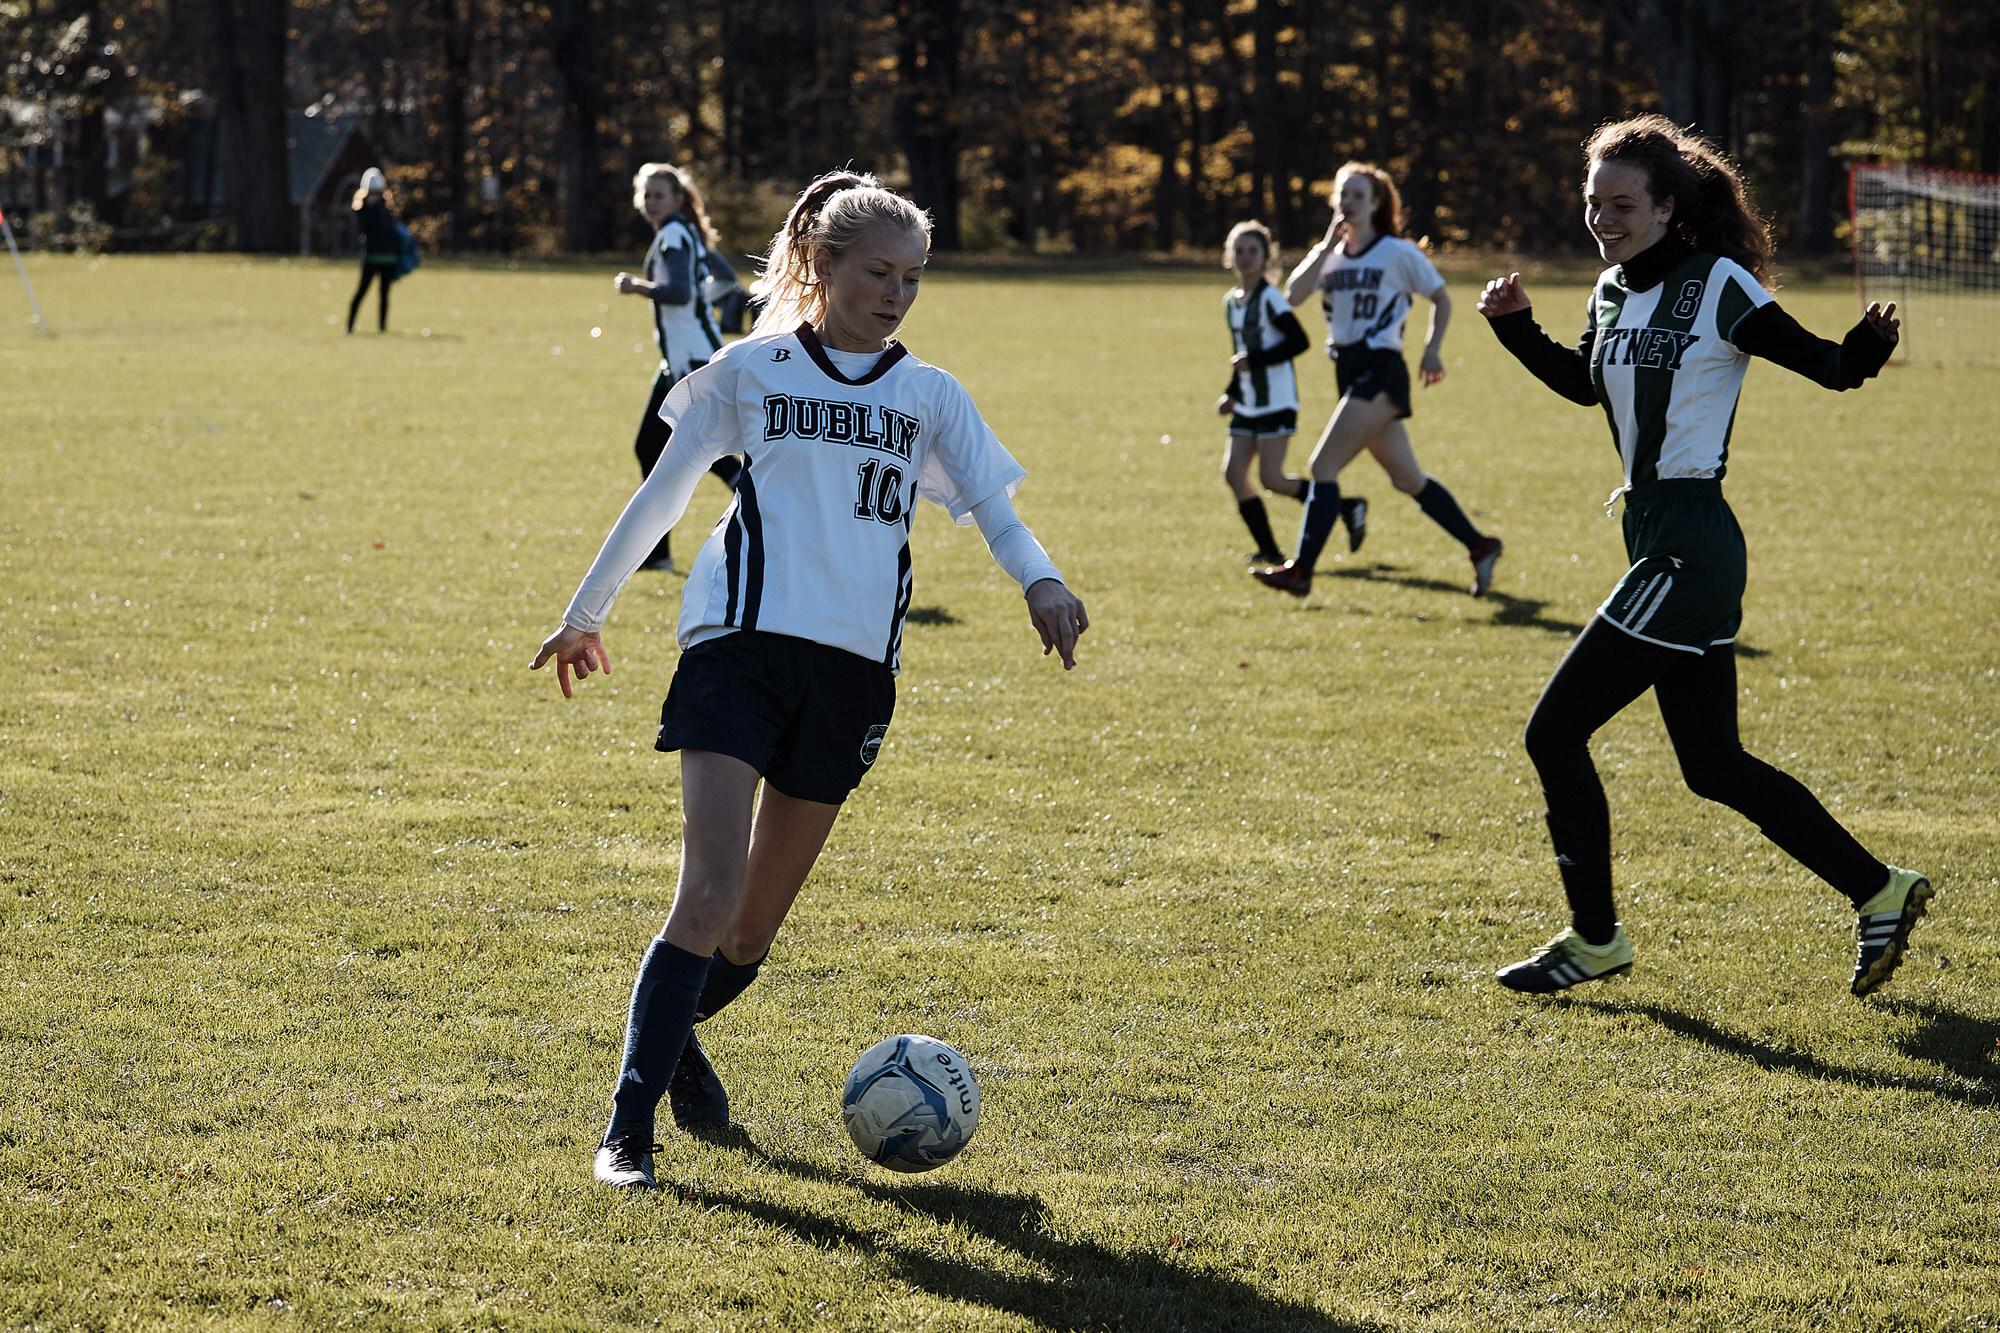 Girls Varsity Soccer vs. Putney School - October 26, 2018 - 003.jpg